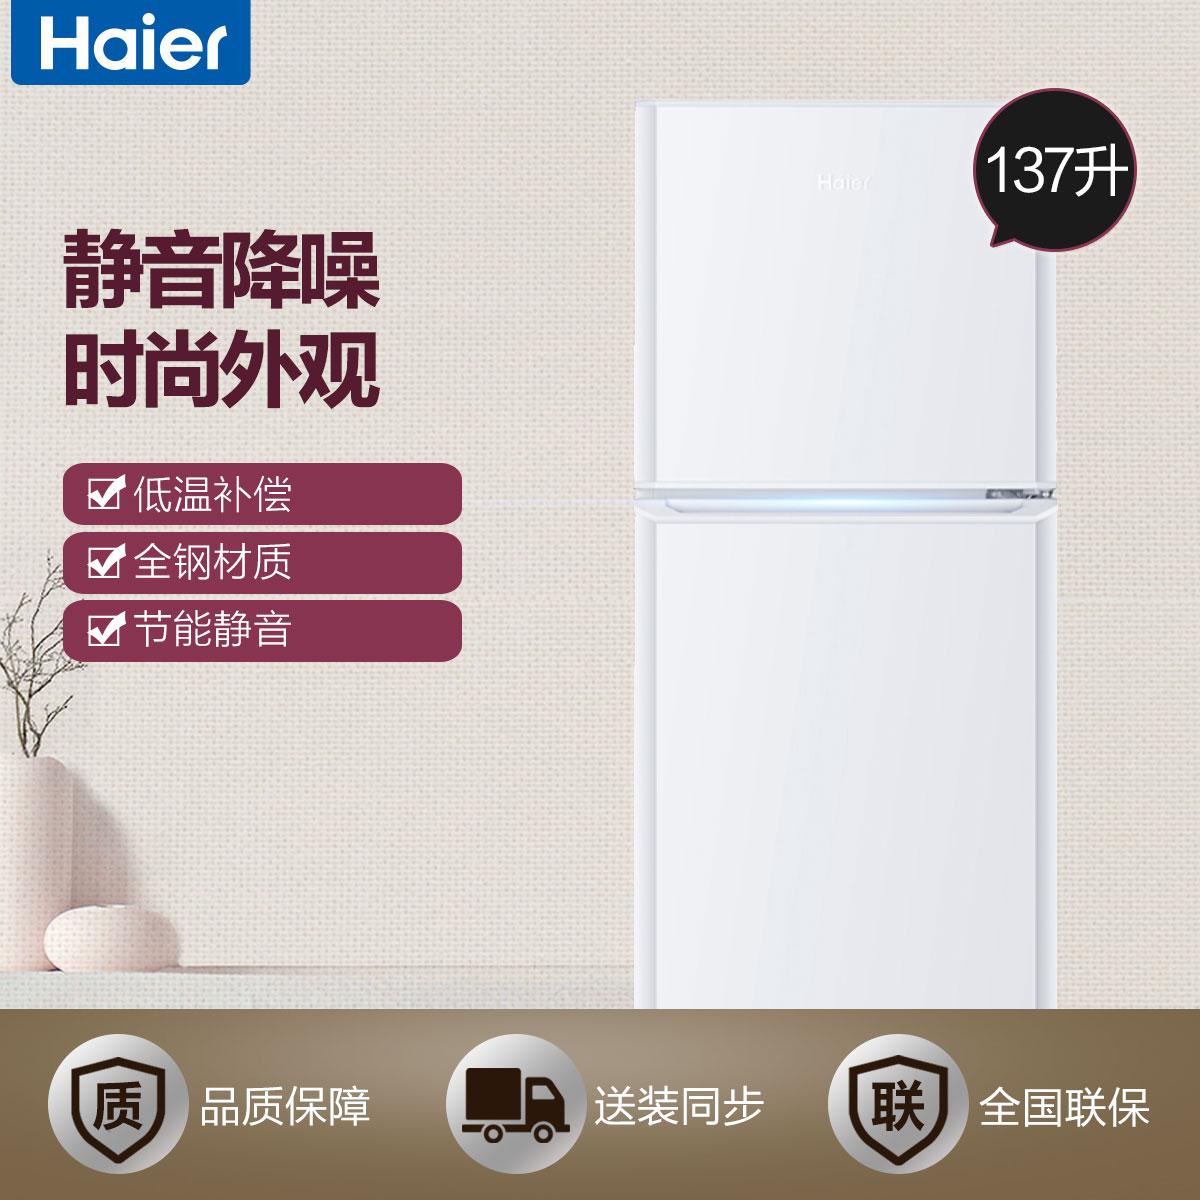 Haier/海尔 冰箱 BCD-137TMPF